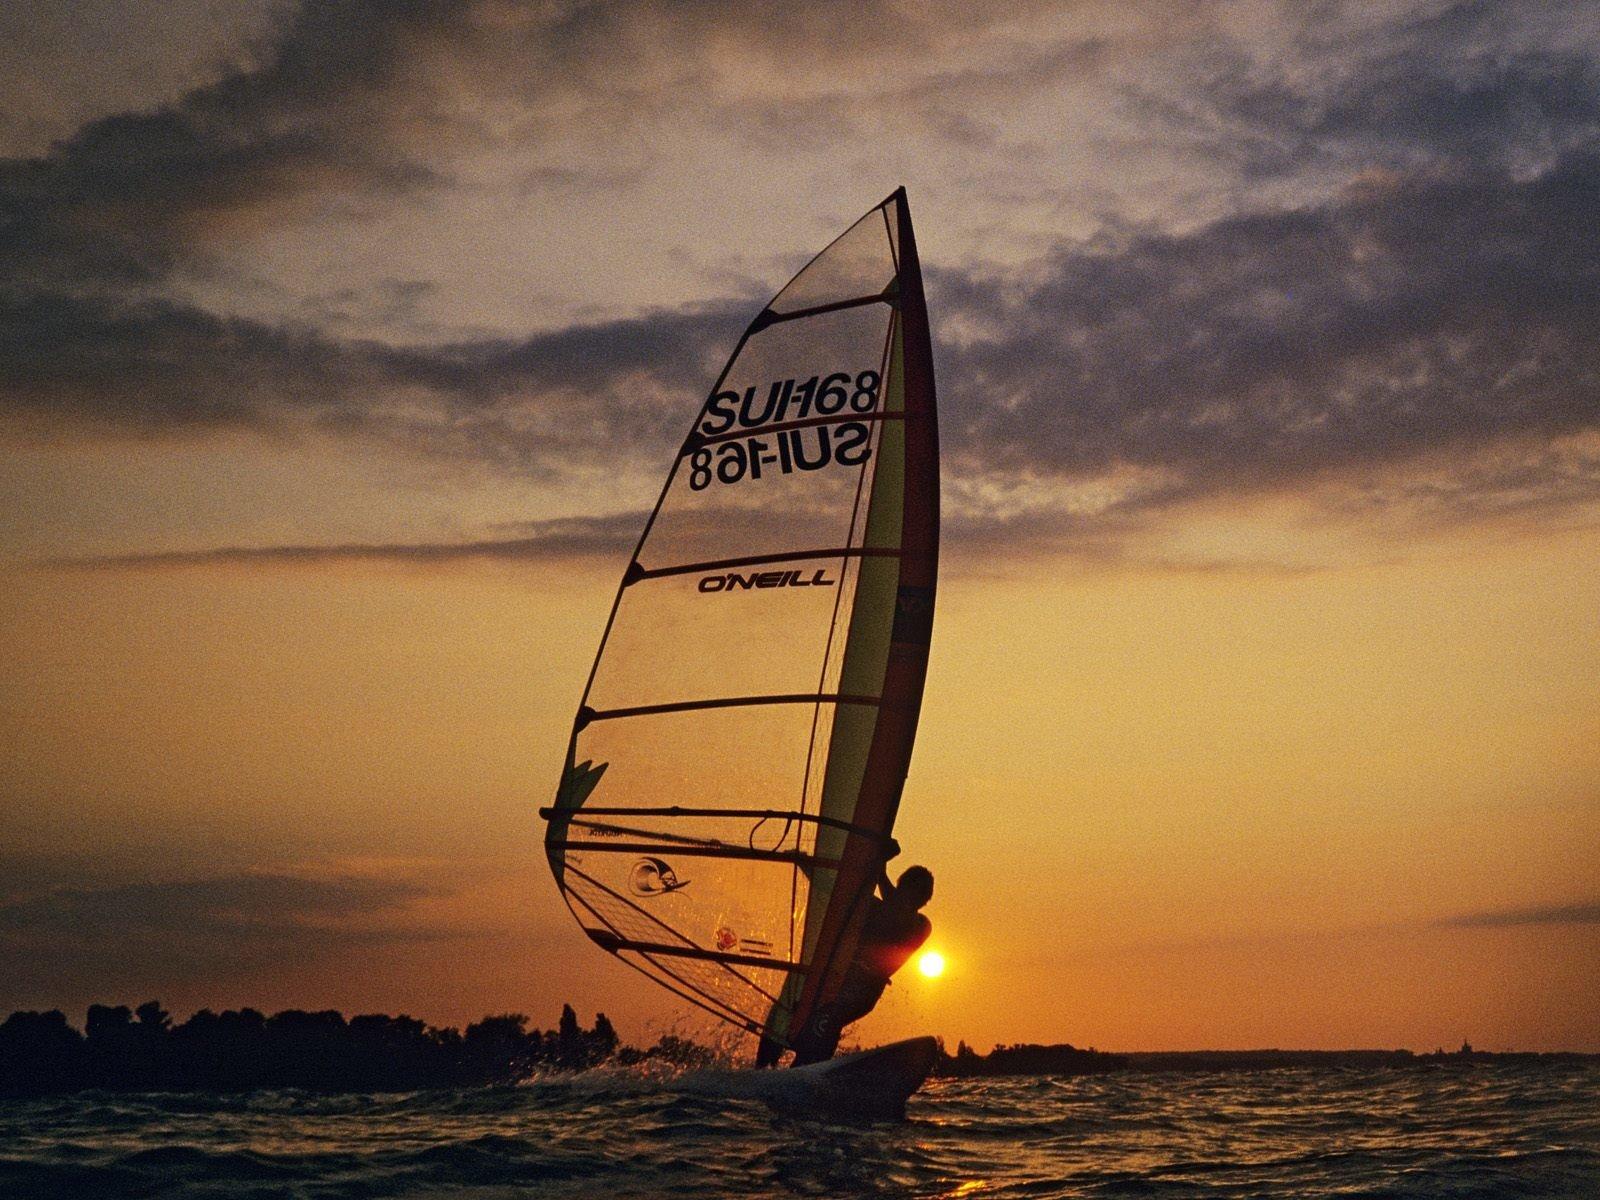 WINDSURF windsurfing surfing surf wallpaper x